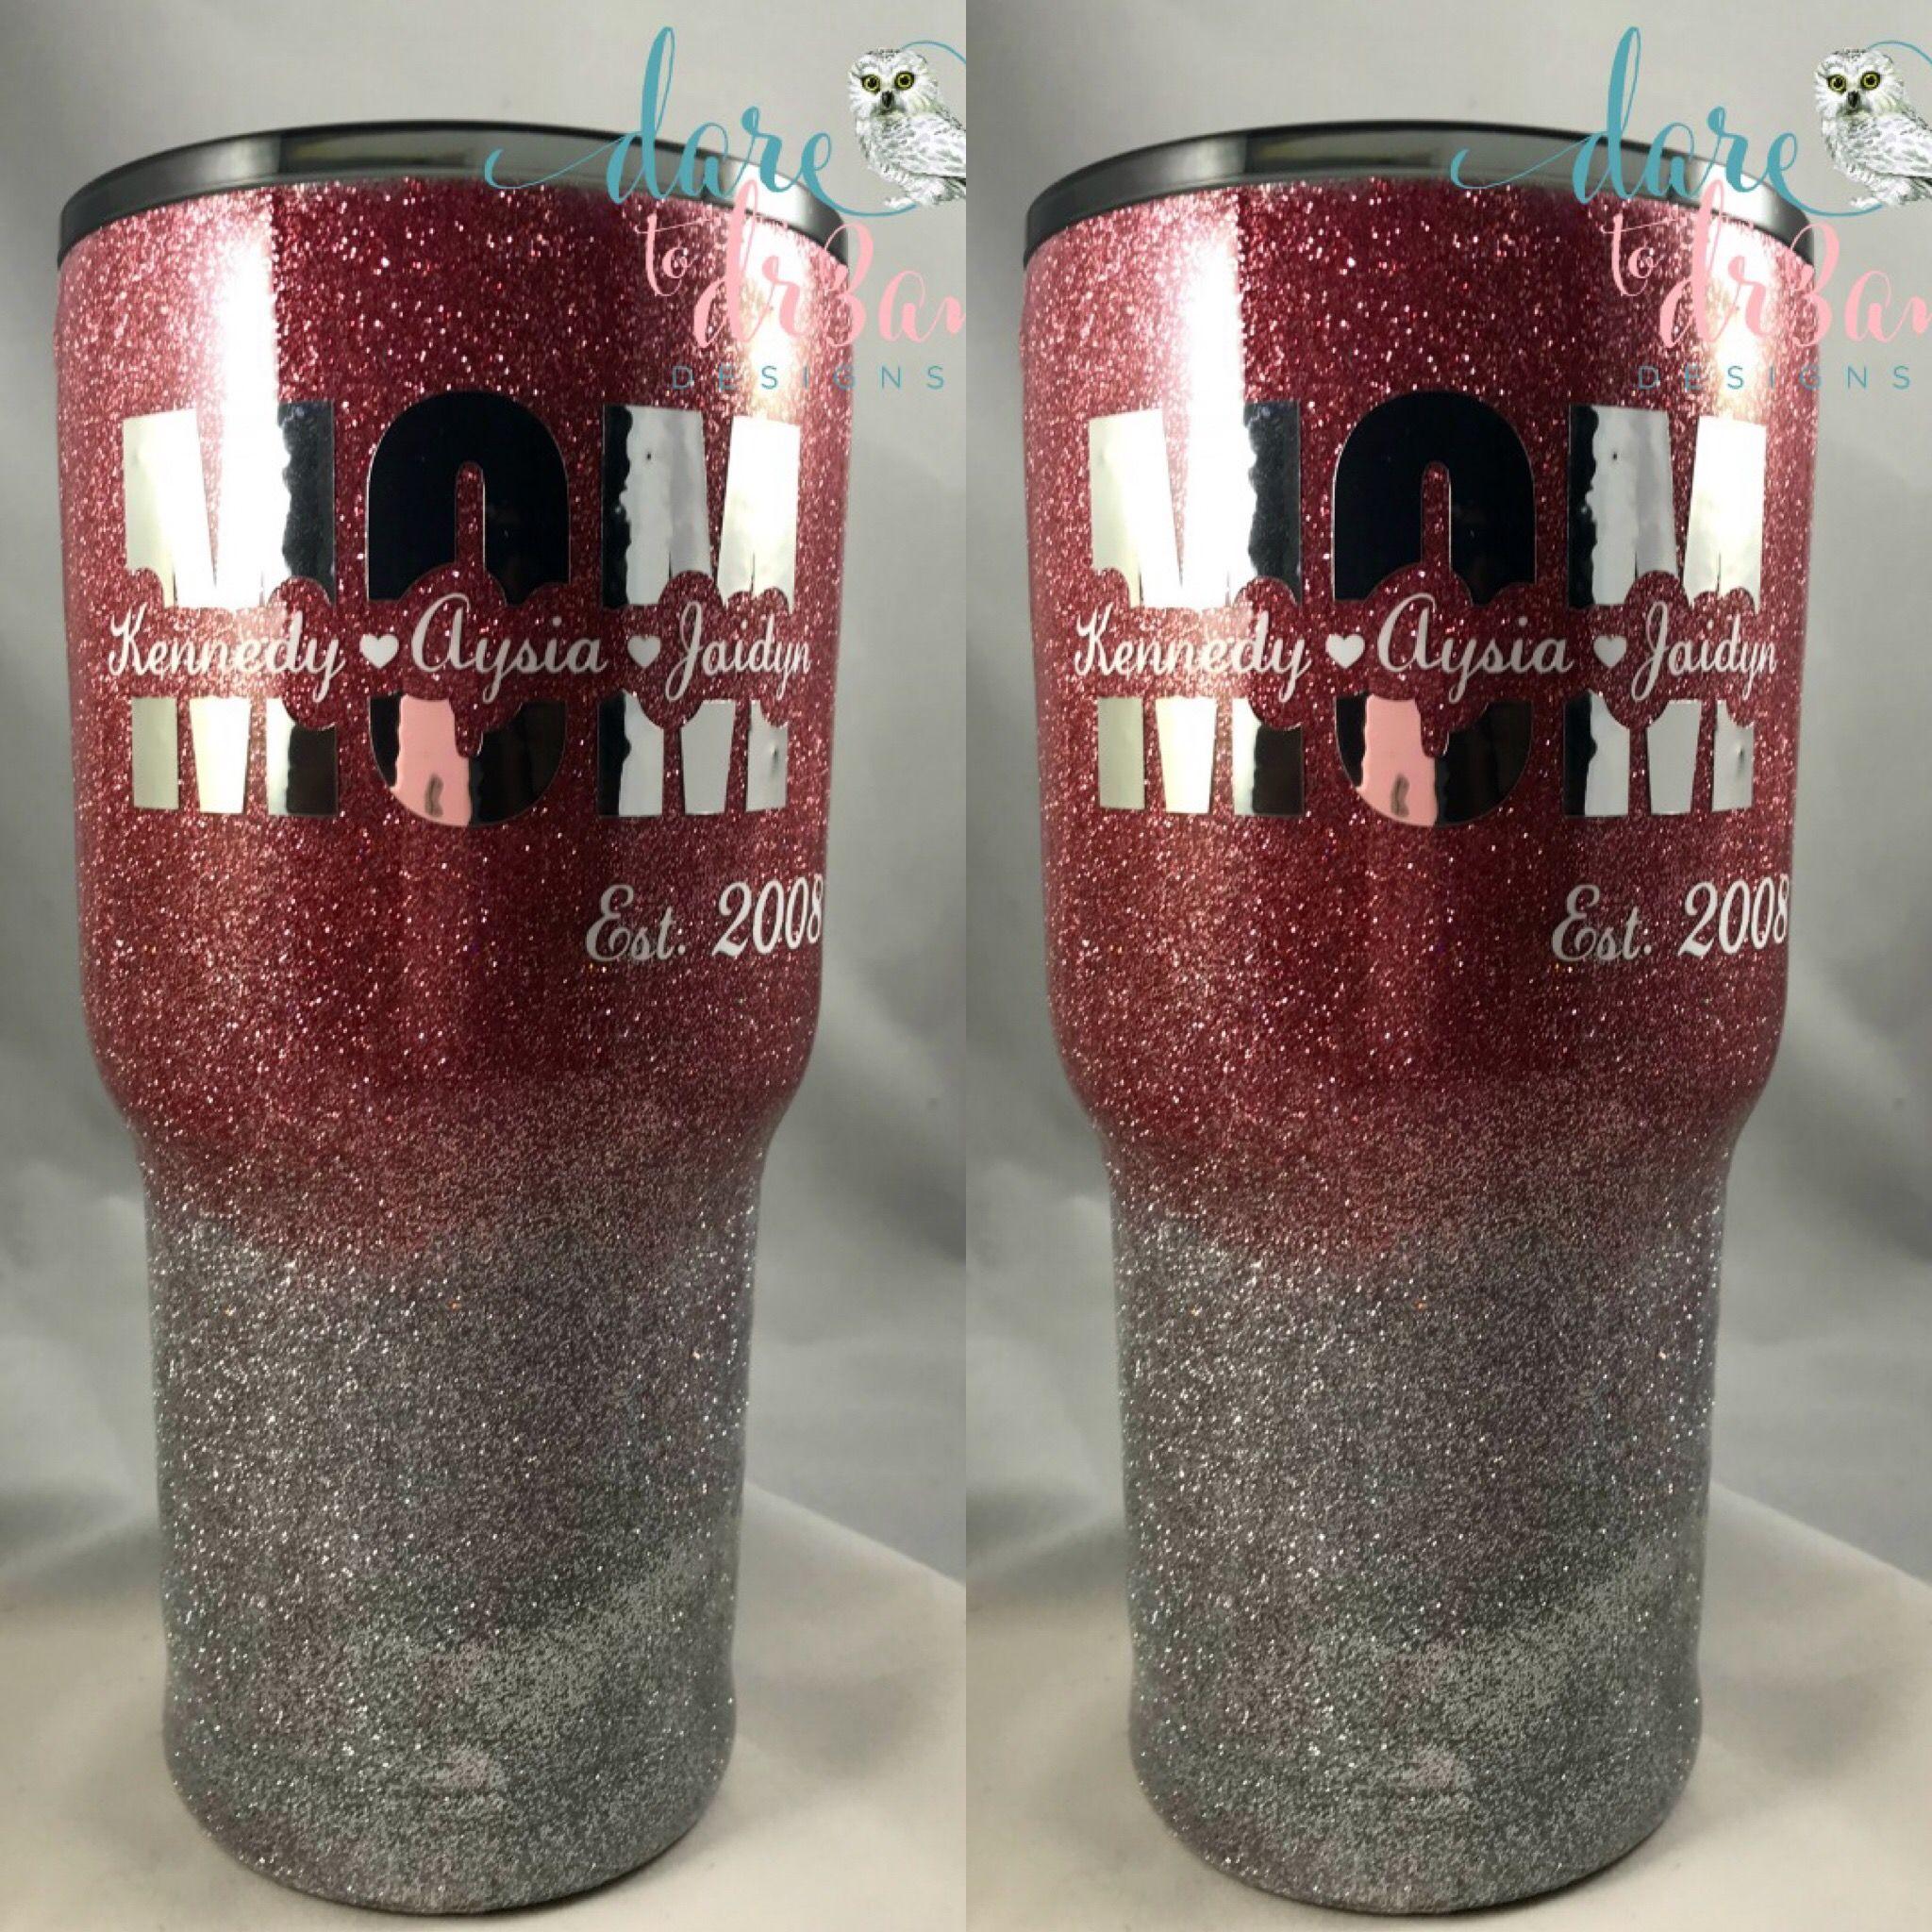 Glitter Tumbler Blessed Mama Glittered Tumbler Stainless Steel,Personalized Gifts,Teacher Gift,Custom Tumbler,Gifts for Her